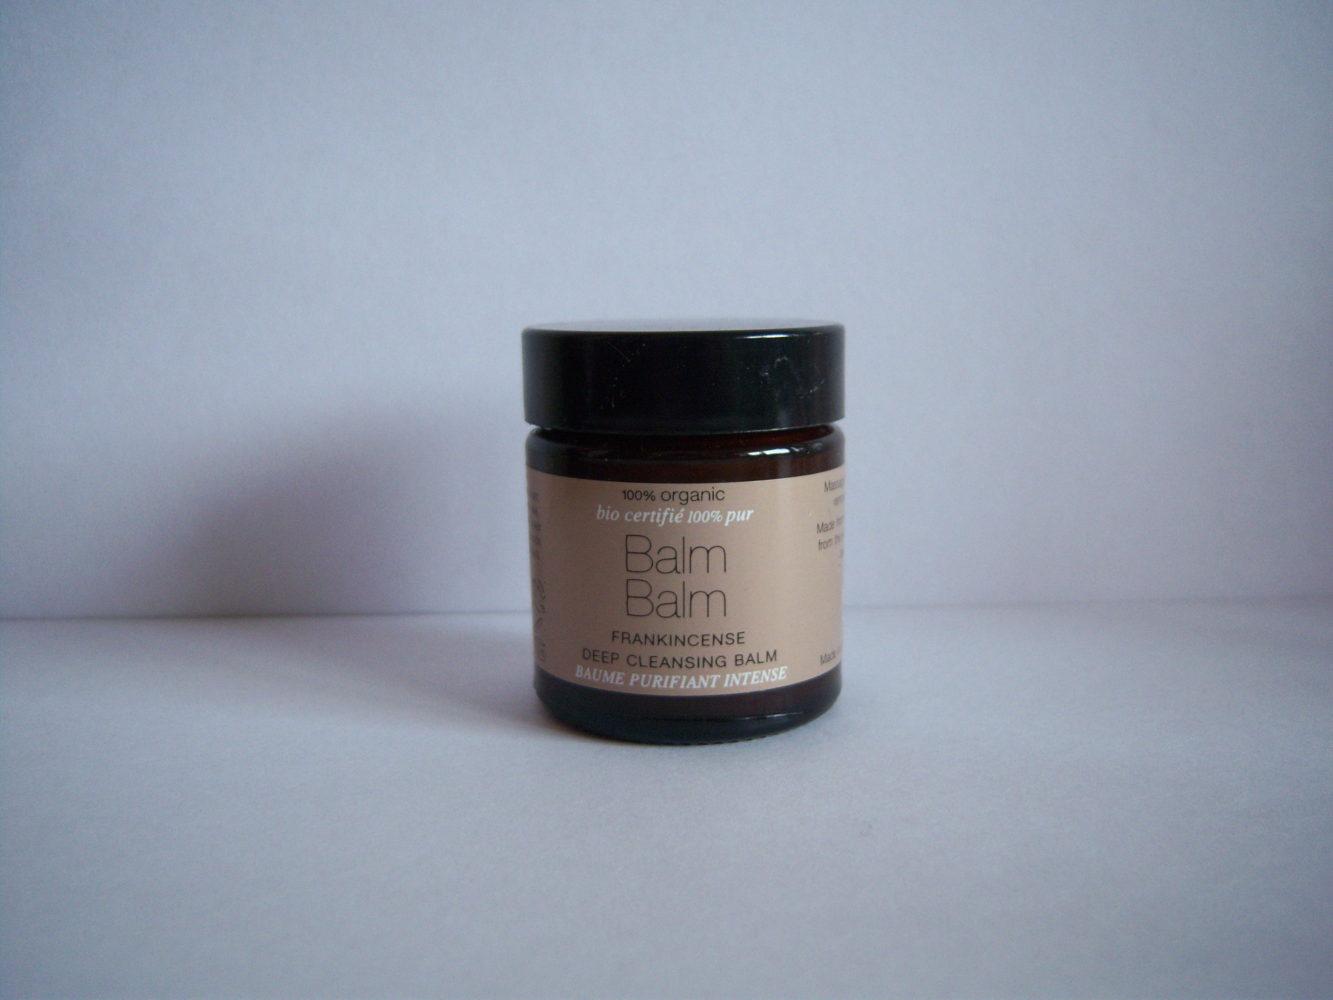 Balm Balm ~ Frankincense Deep Cleansing Balm Review